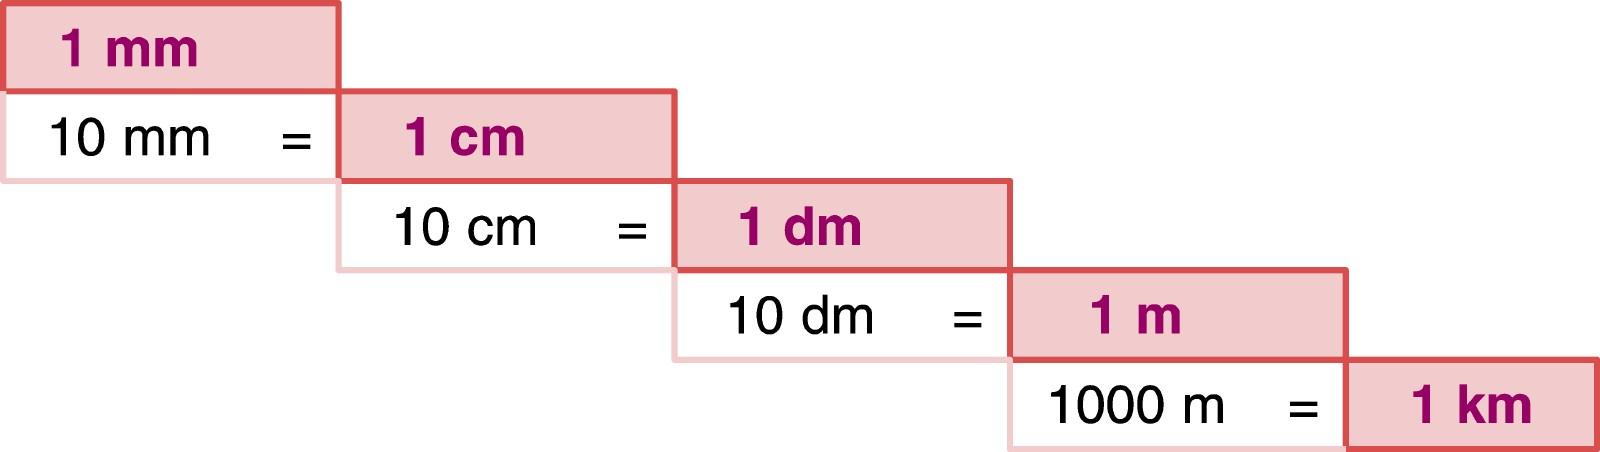 Deciméter centiméter